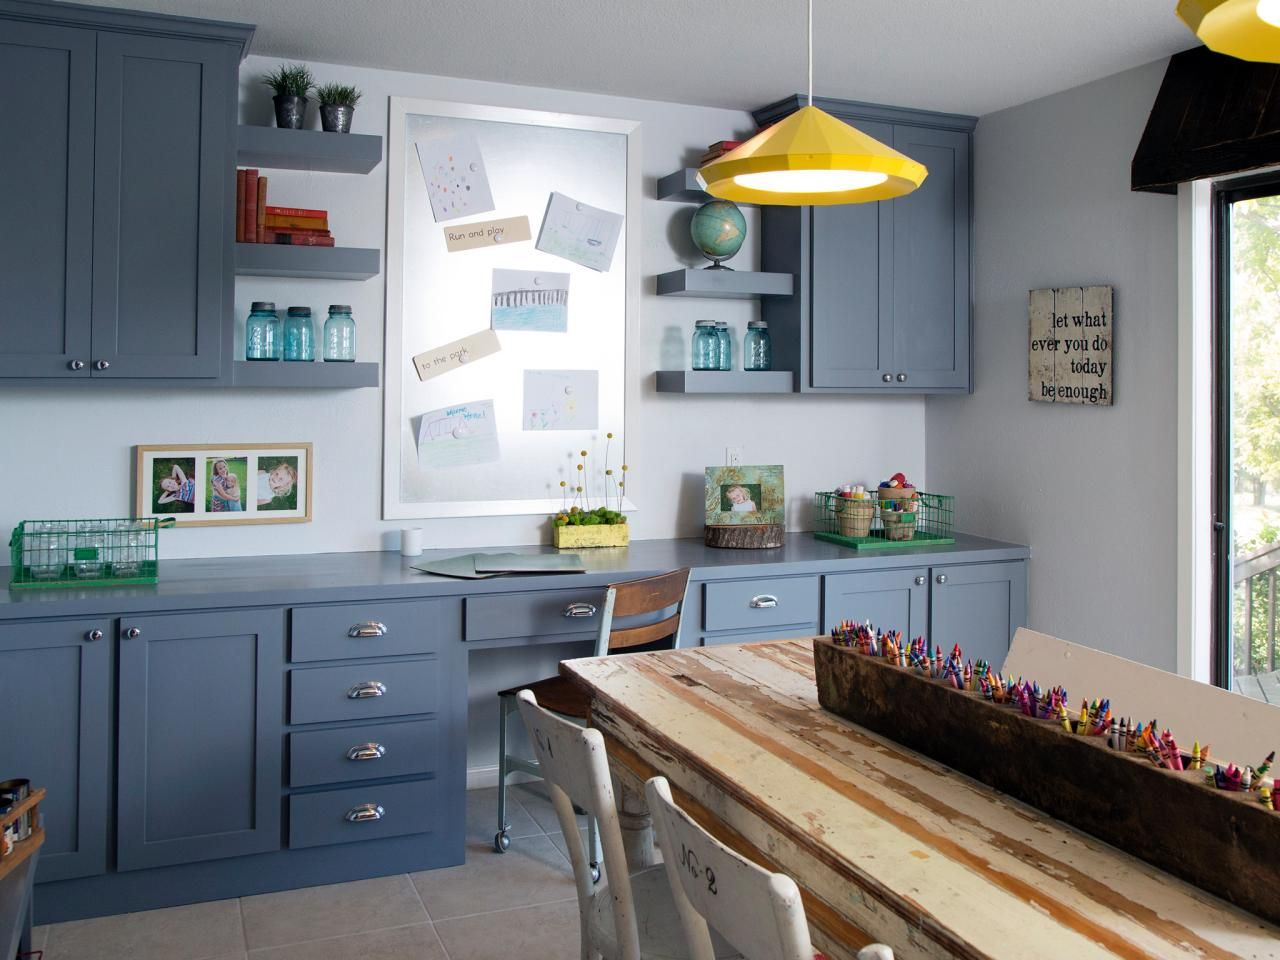 Craft room cabinets idea - Fixer Upper Retro 70s Redo With A Dash Of Fresh Herbs